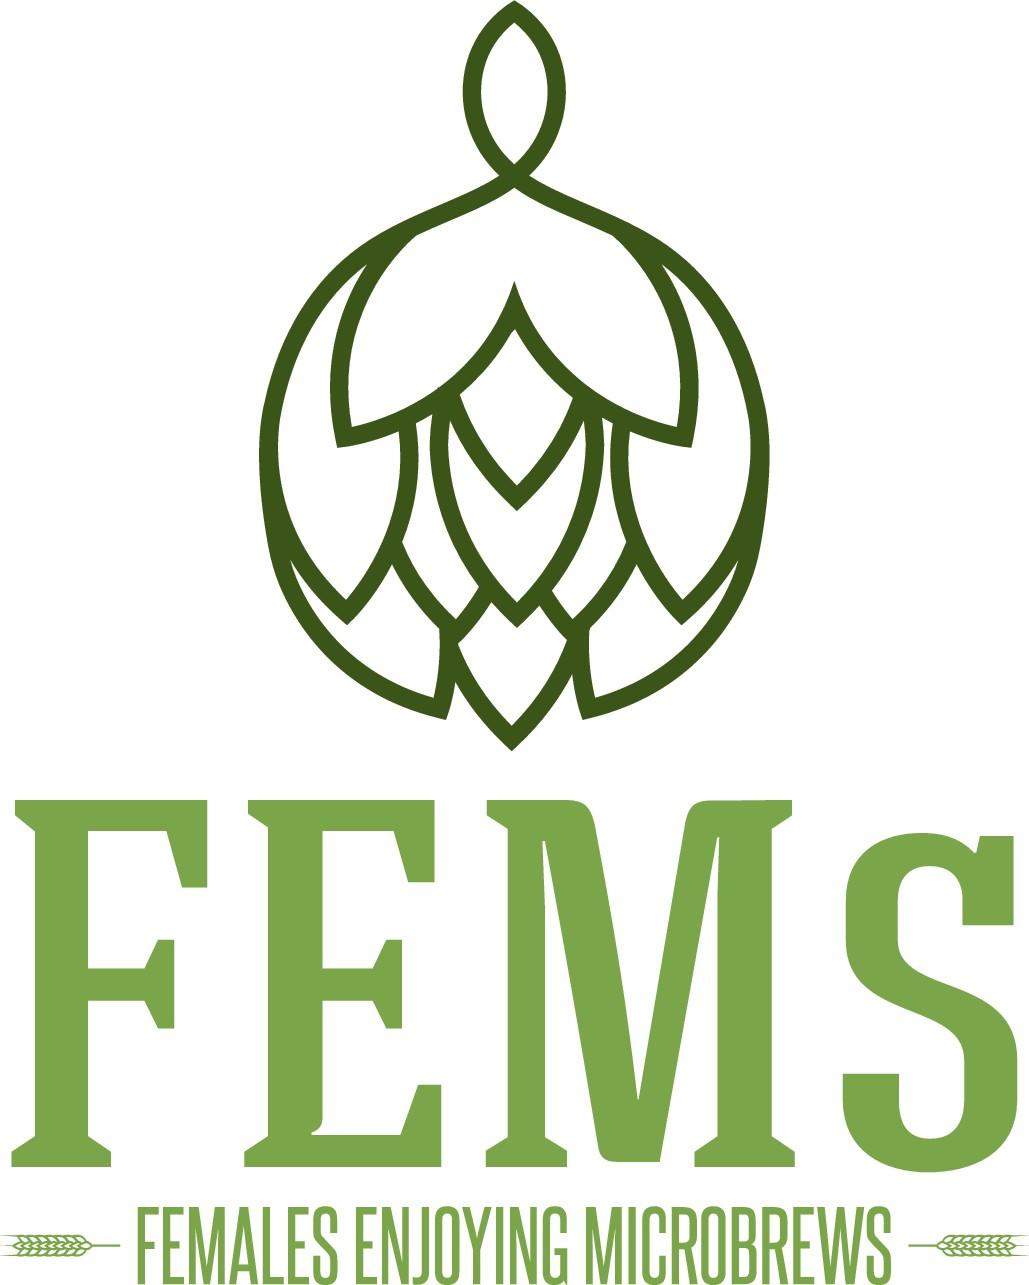 Females Enjoying Microbrews- women beer appreciation group needs logo!